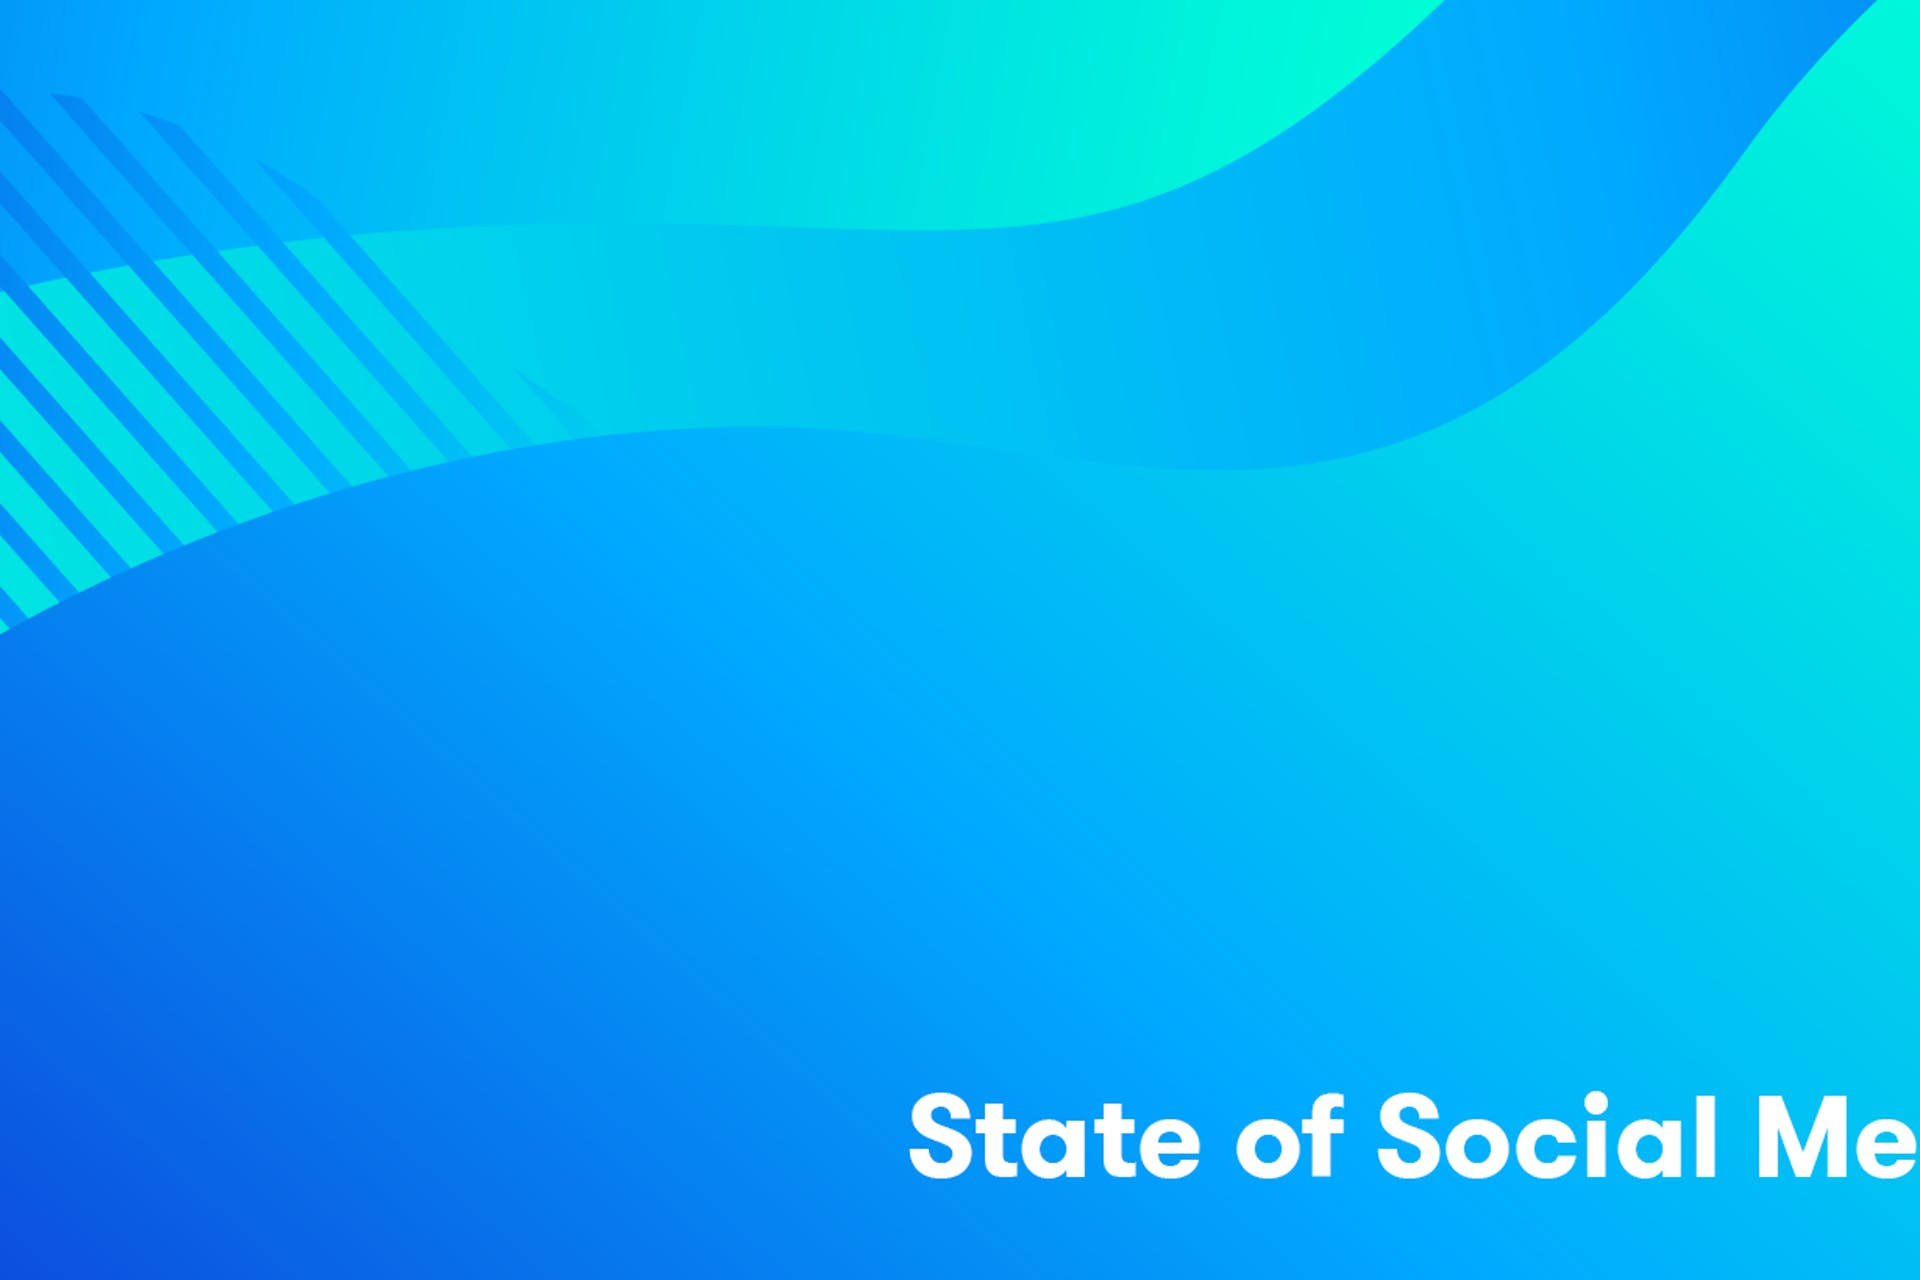 State of Social media report